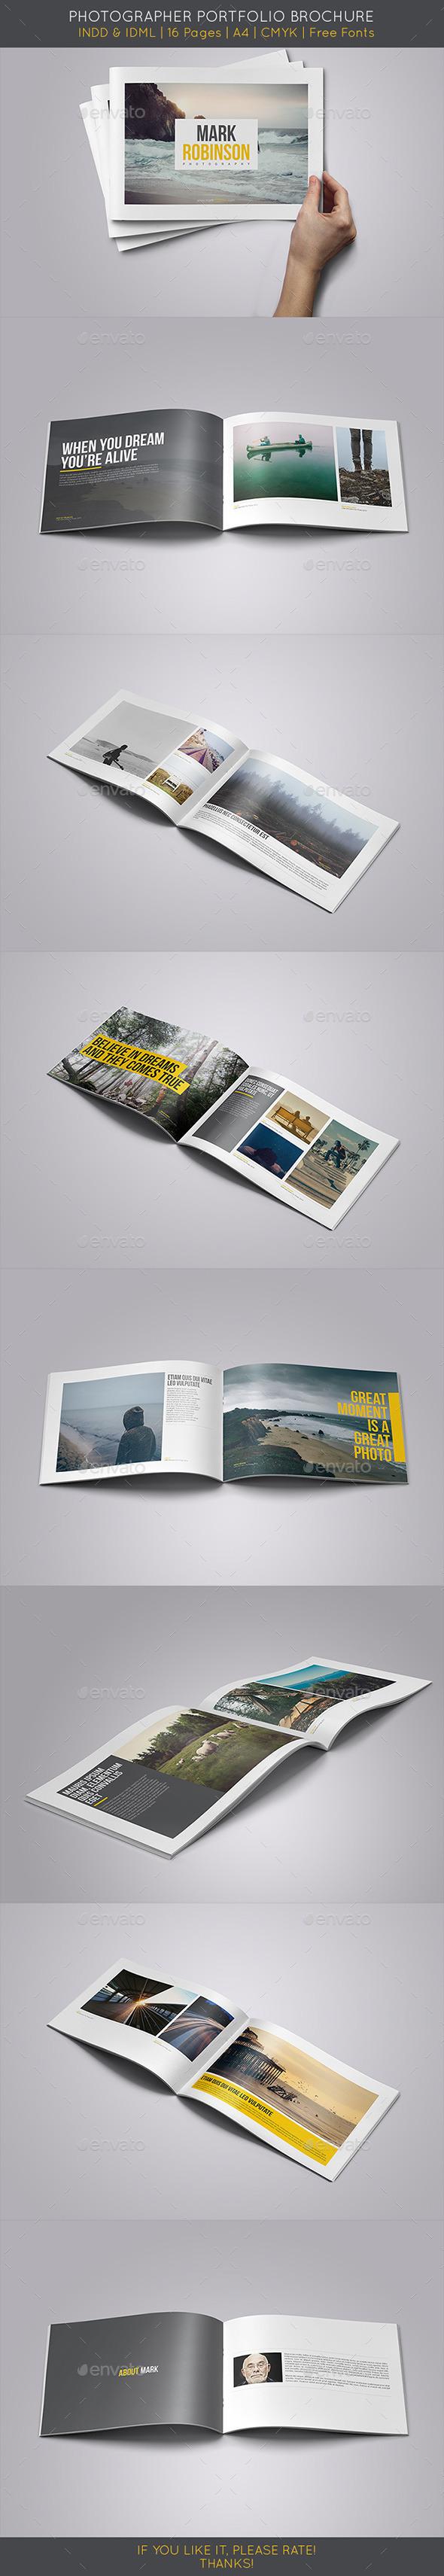 Portfolio Brochure Vol.1 - Portfolio Brochures